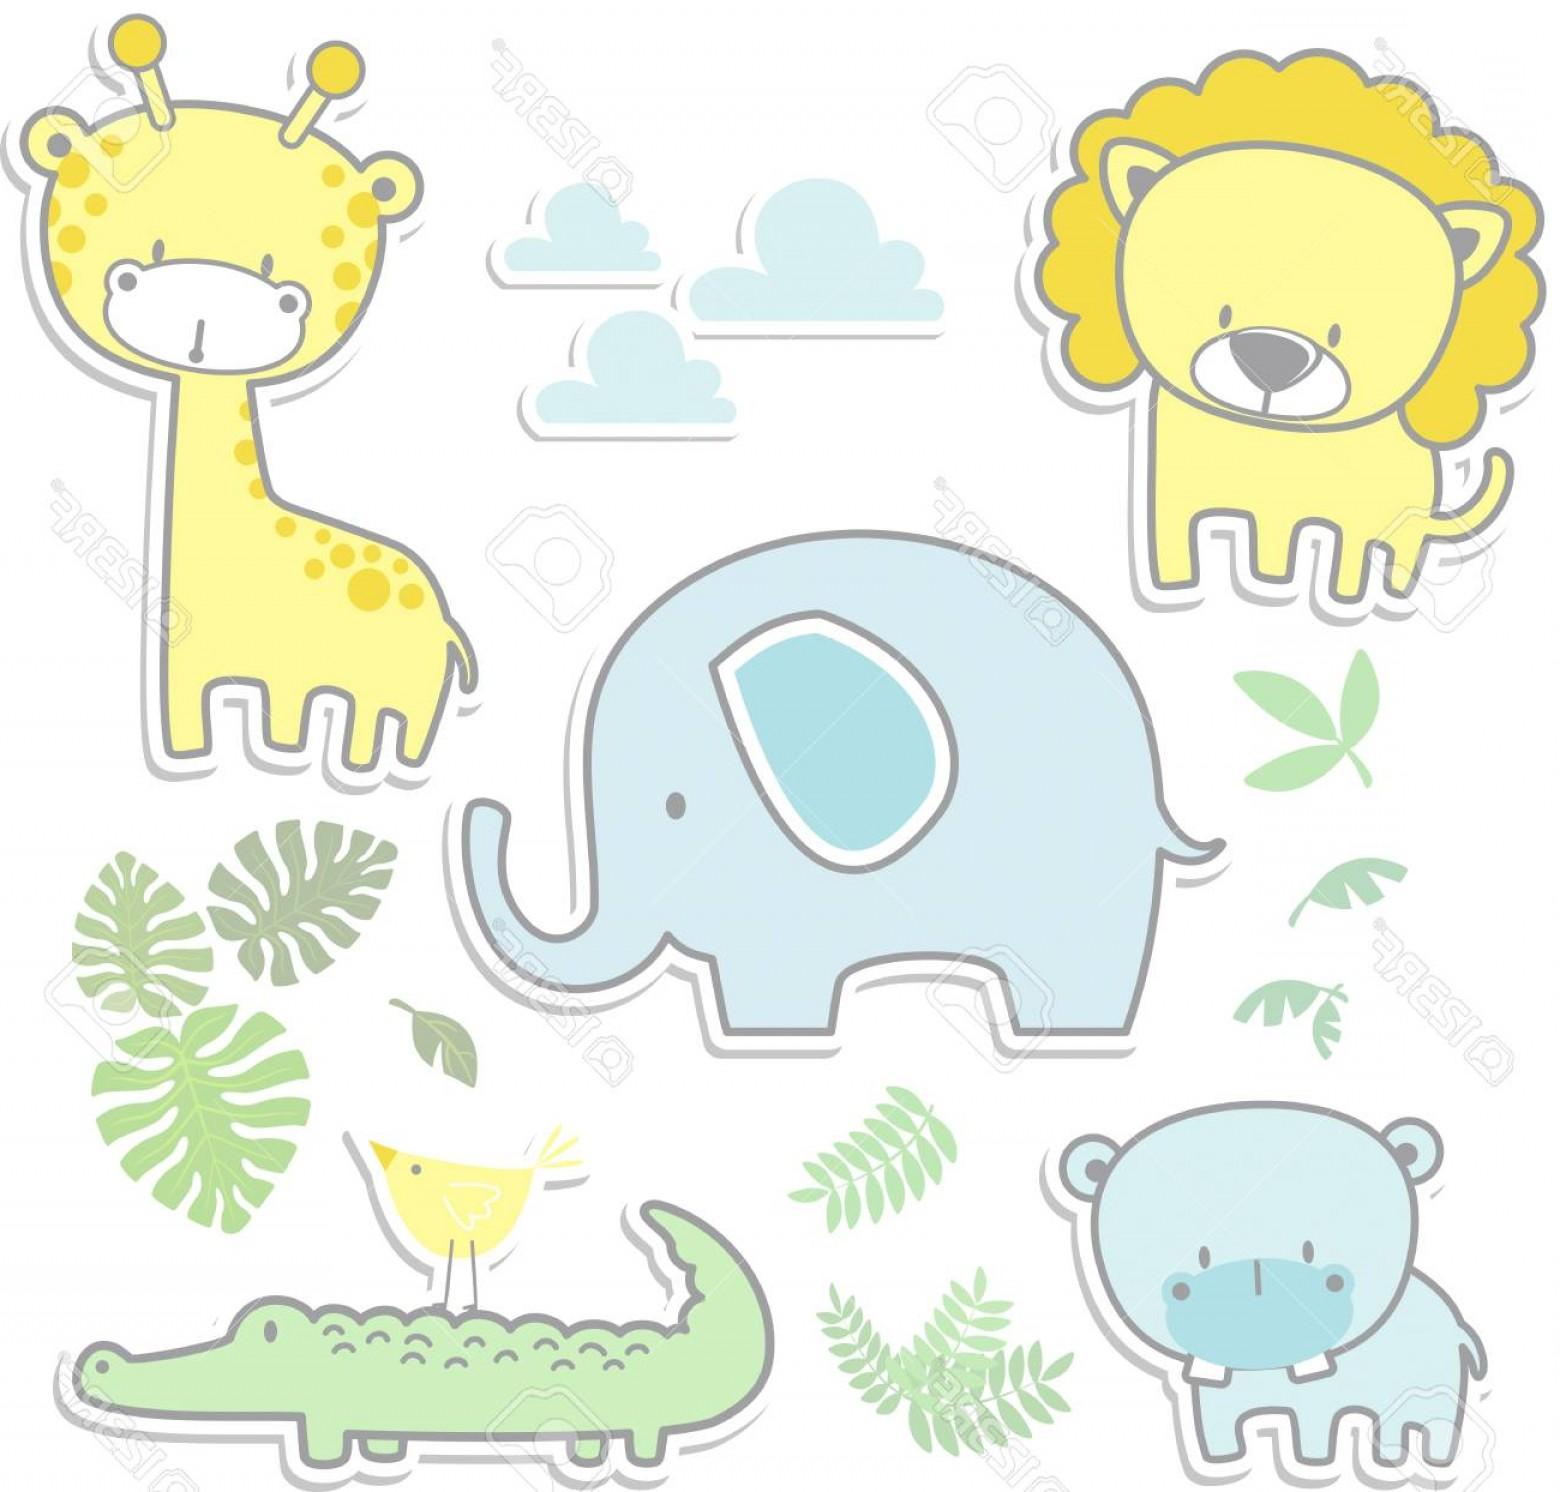 1560x1492 Baby Jungle Animals Vector Arenawp